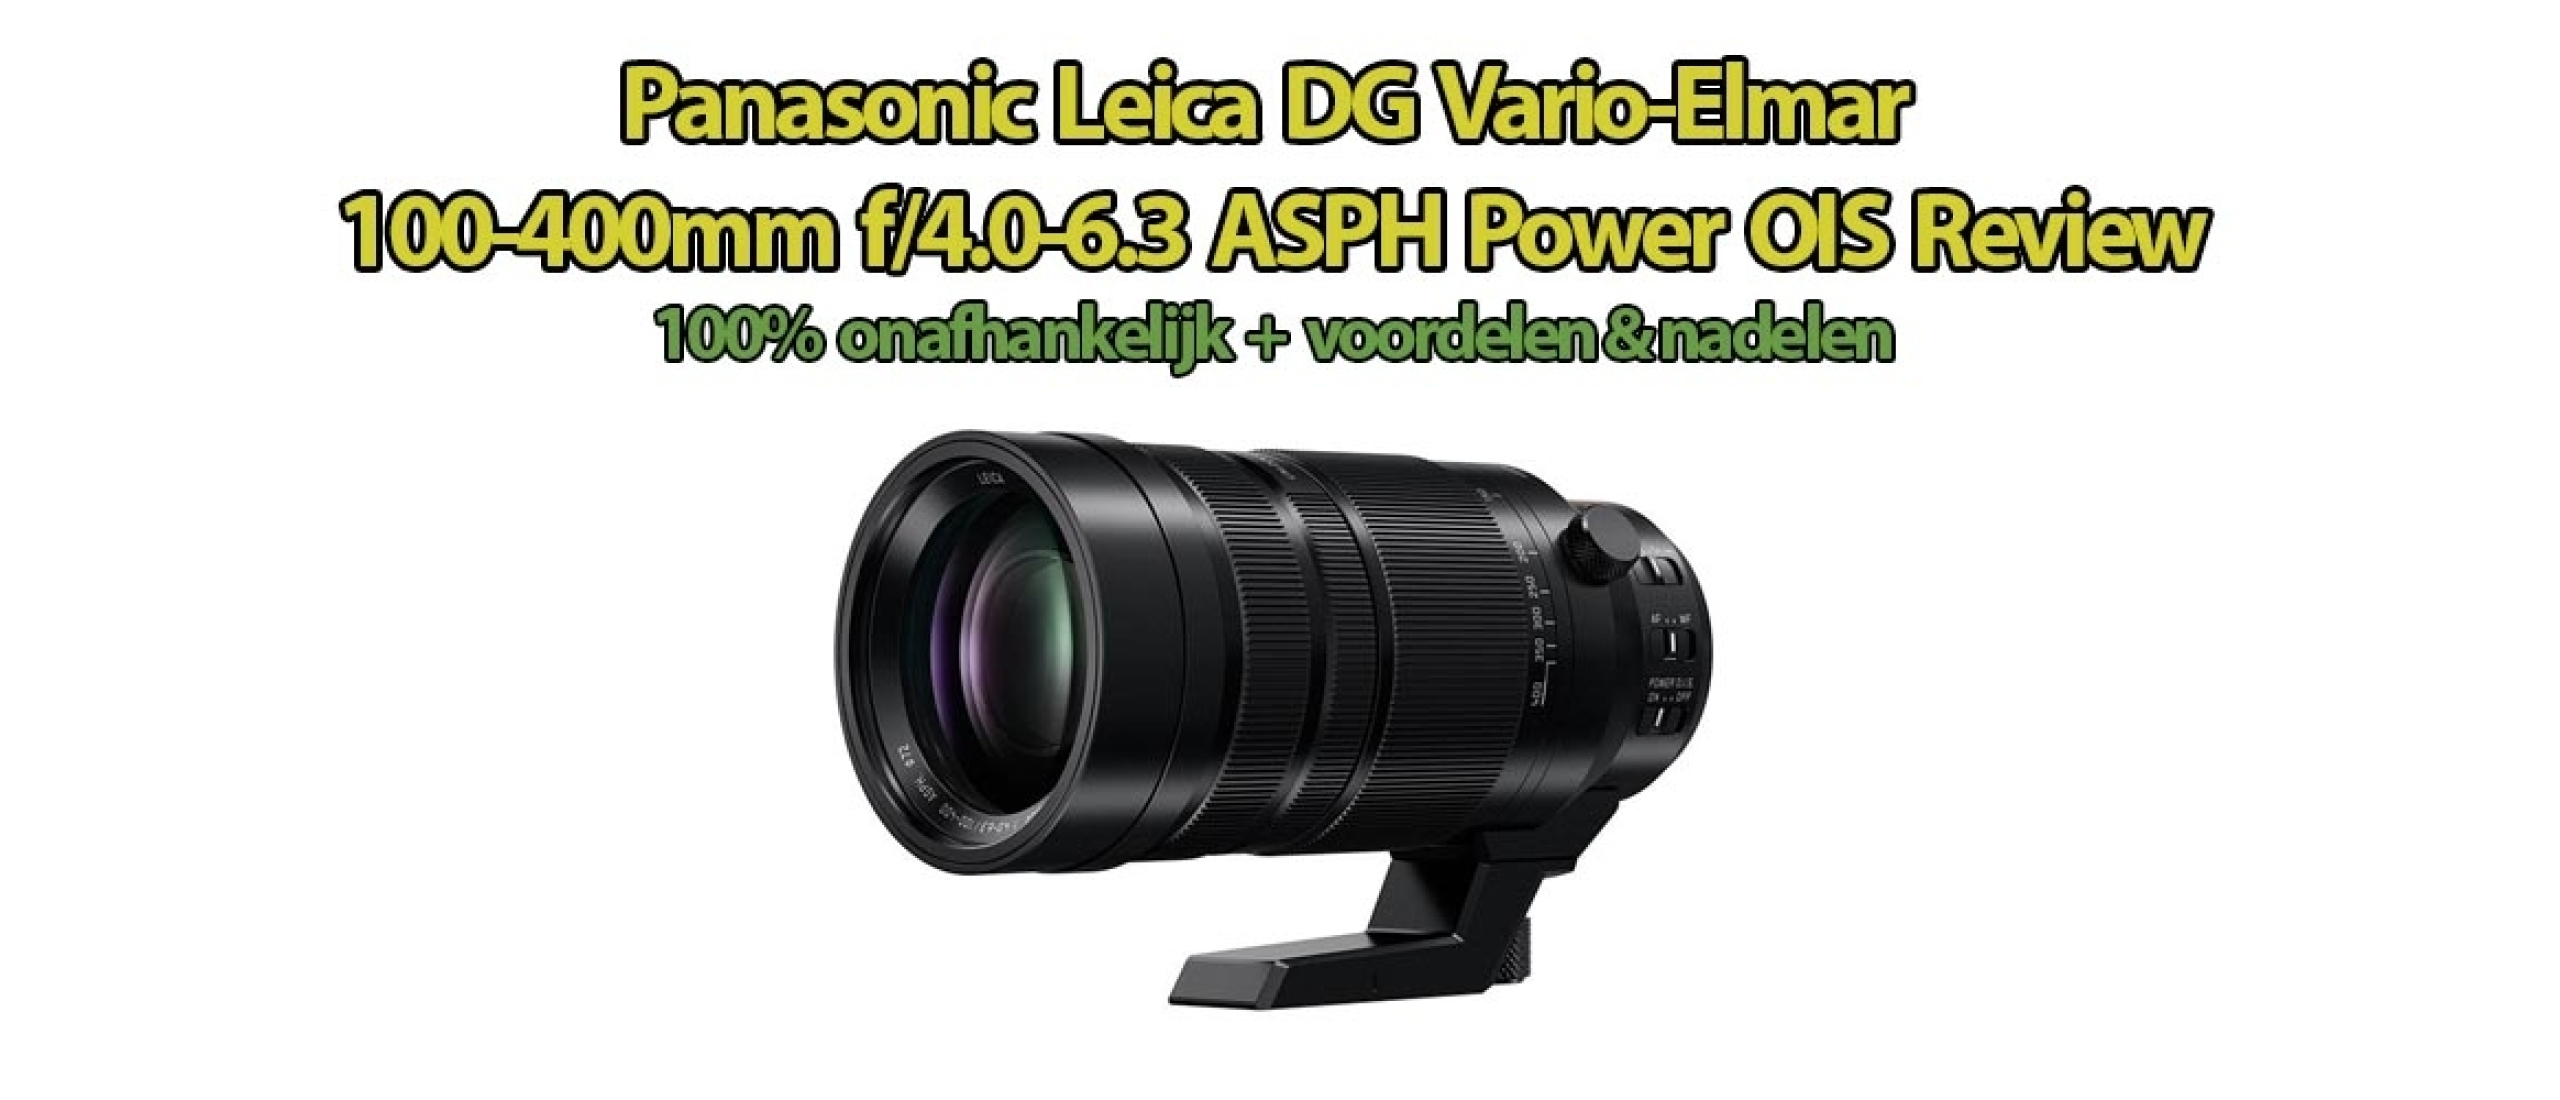 Panasonic Leica DG Vario-Elmar 100-400mm f/4.0-6.3 ASPH Power OIS Review